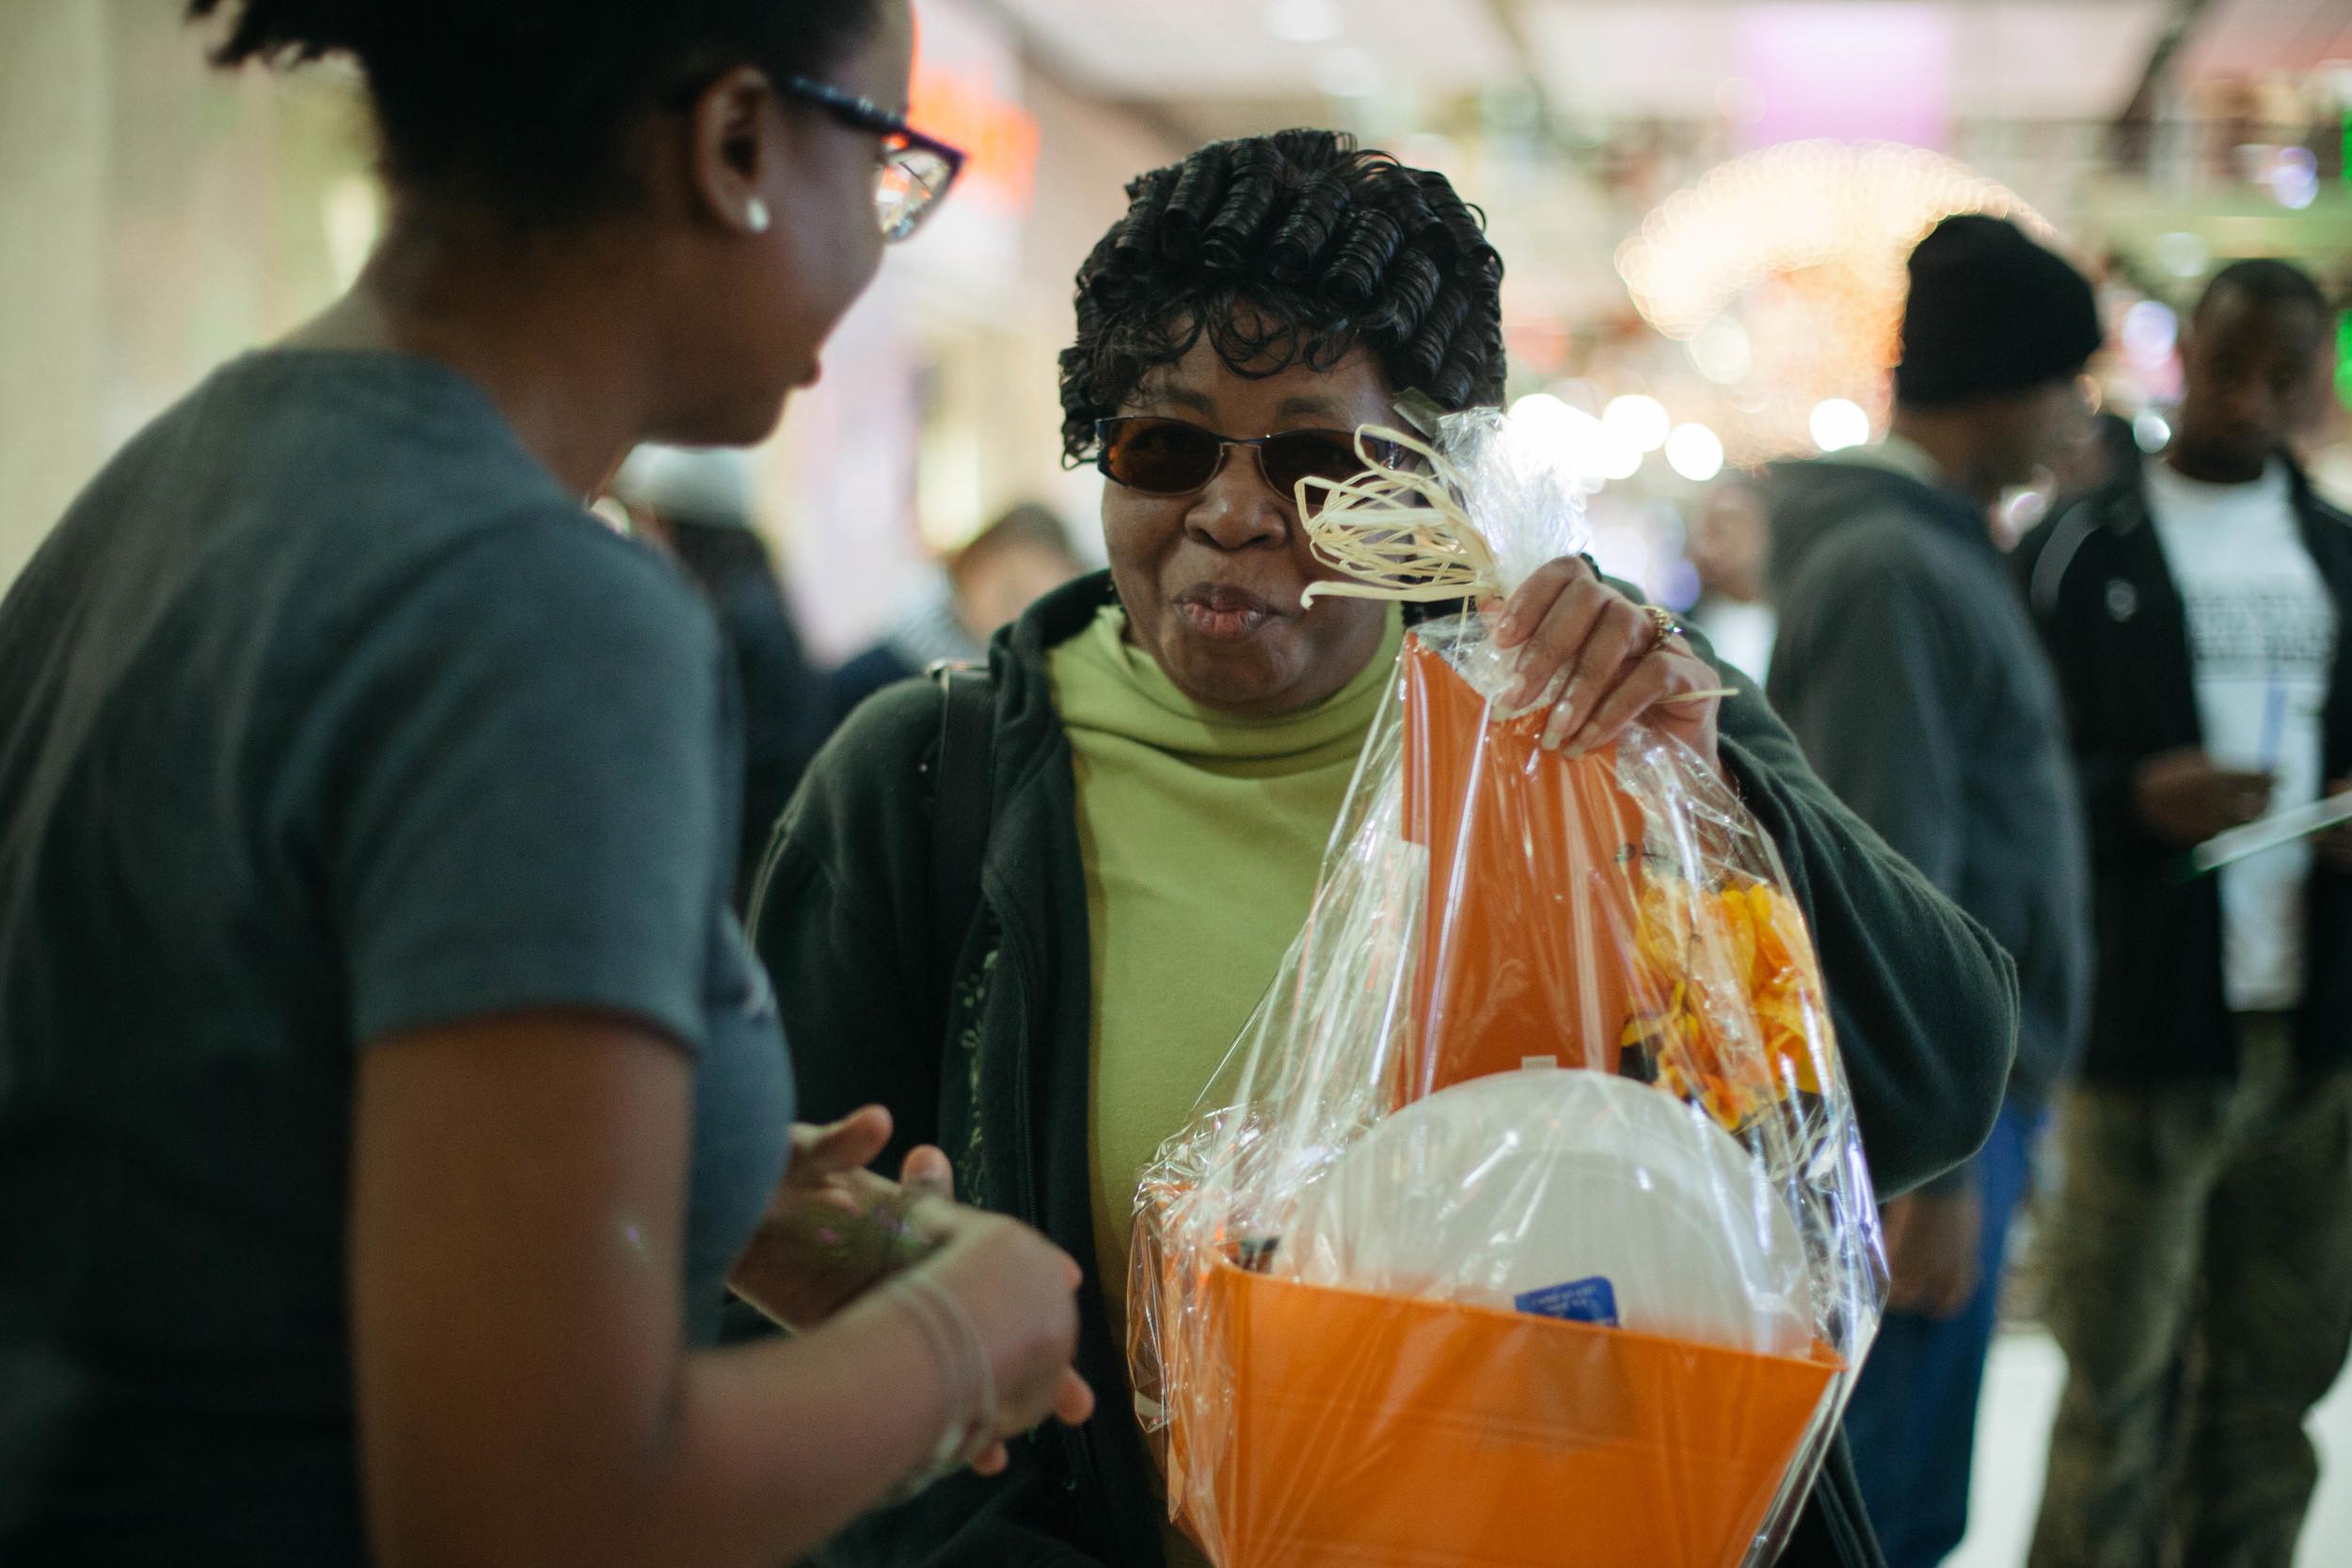 Woman receives basket at Turkey Bash